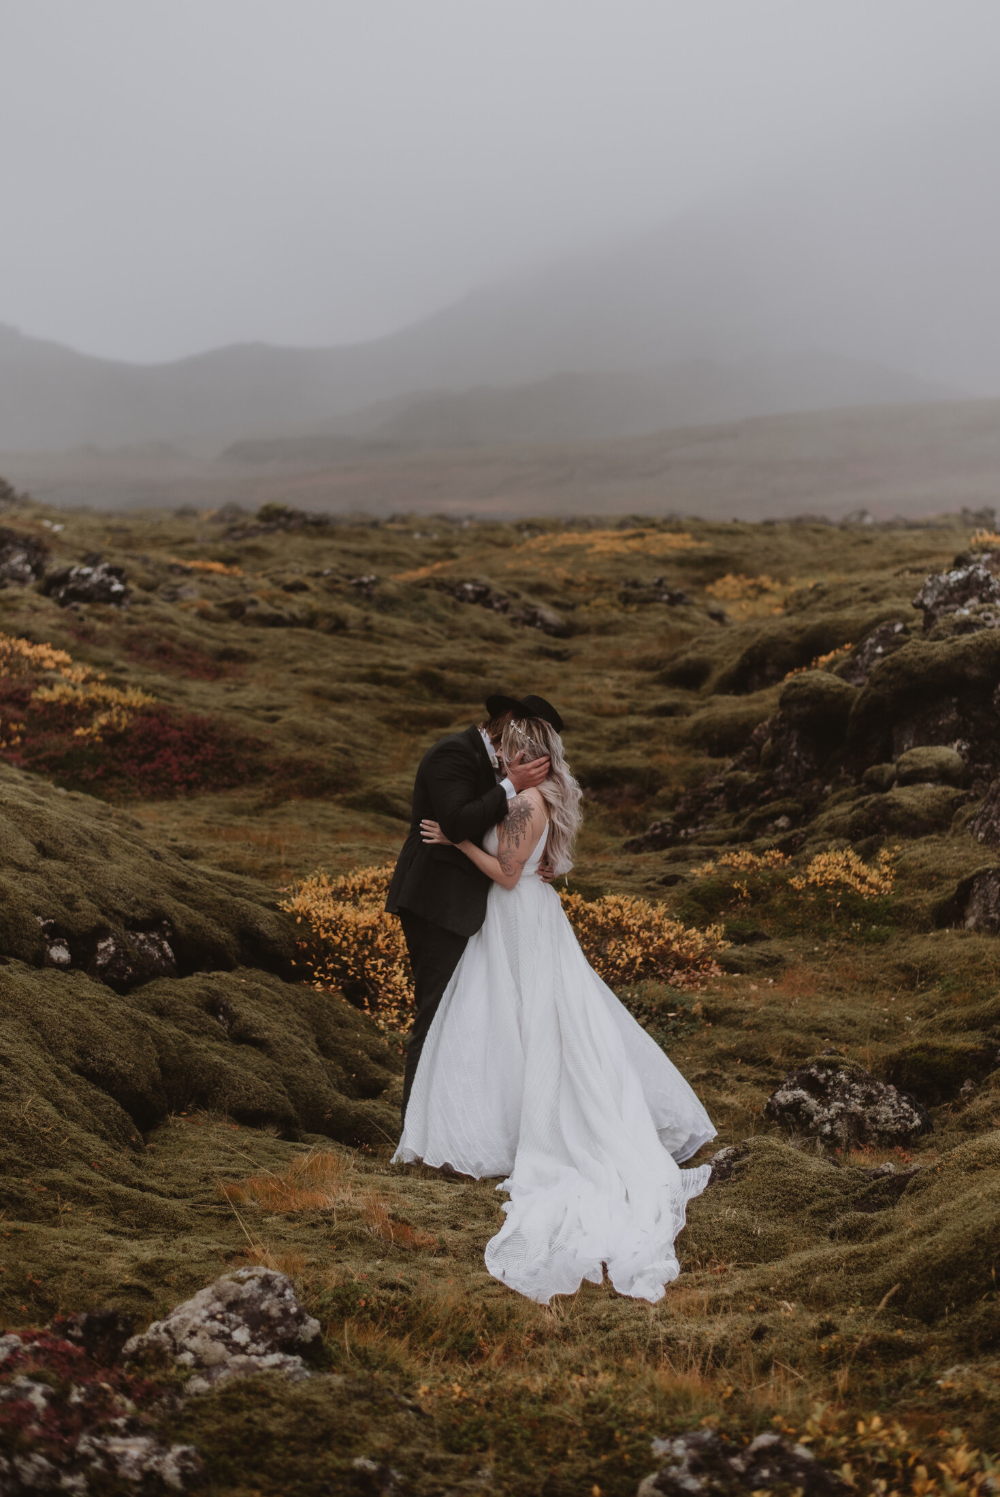 Intimate Iceland Elopement Kaylie Sirek Wyoming Wedding Elopement Photographer Sheridan Buffalo Jackson Hole Billings Bozeman Wyoming Weddings Elopement Photographer Elopement